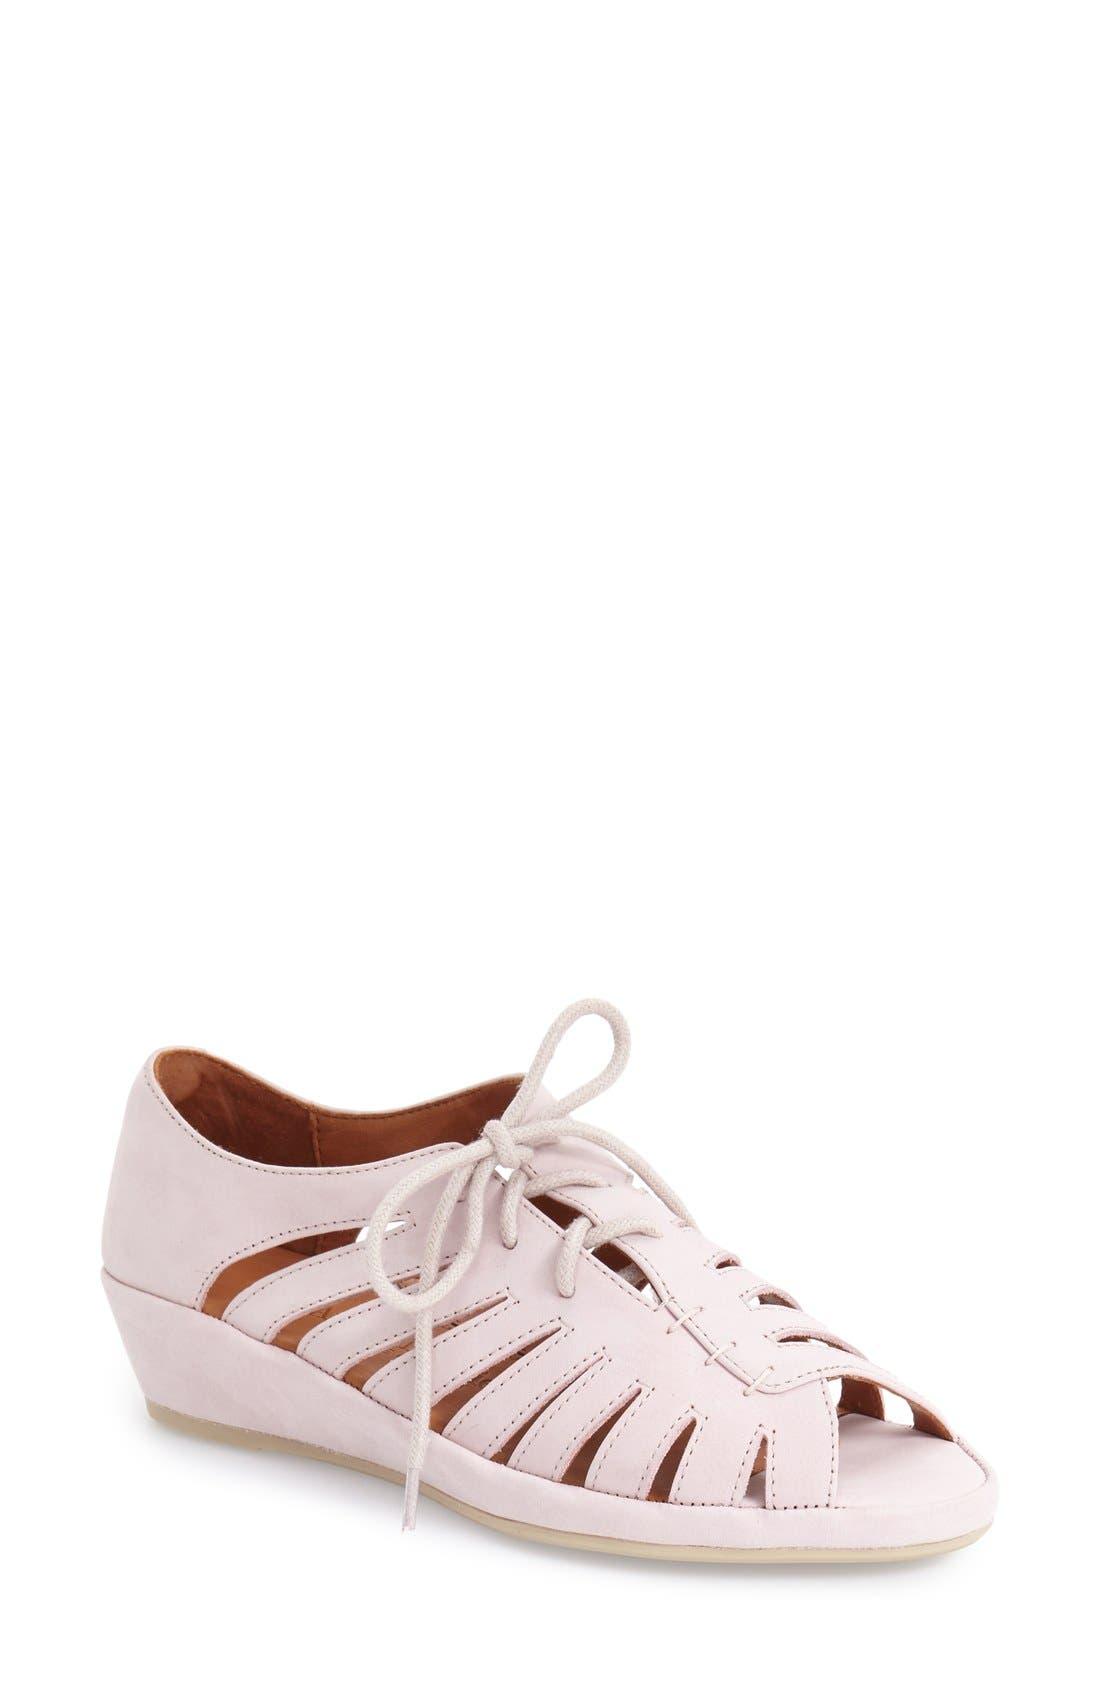 Alternate Image 1 Selected - L'Amour des Pieds 'Bellina' Wedge Sandal (Women)